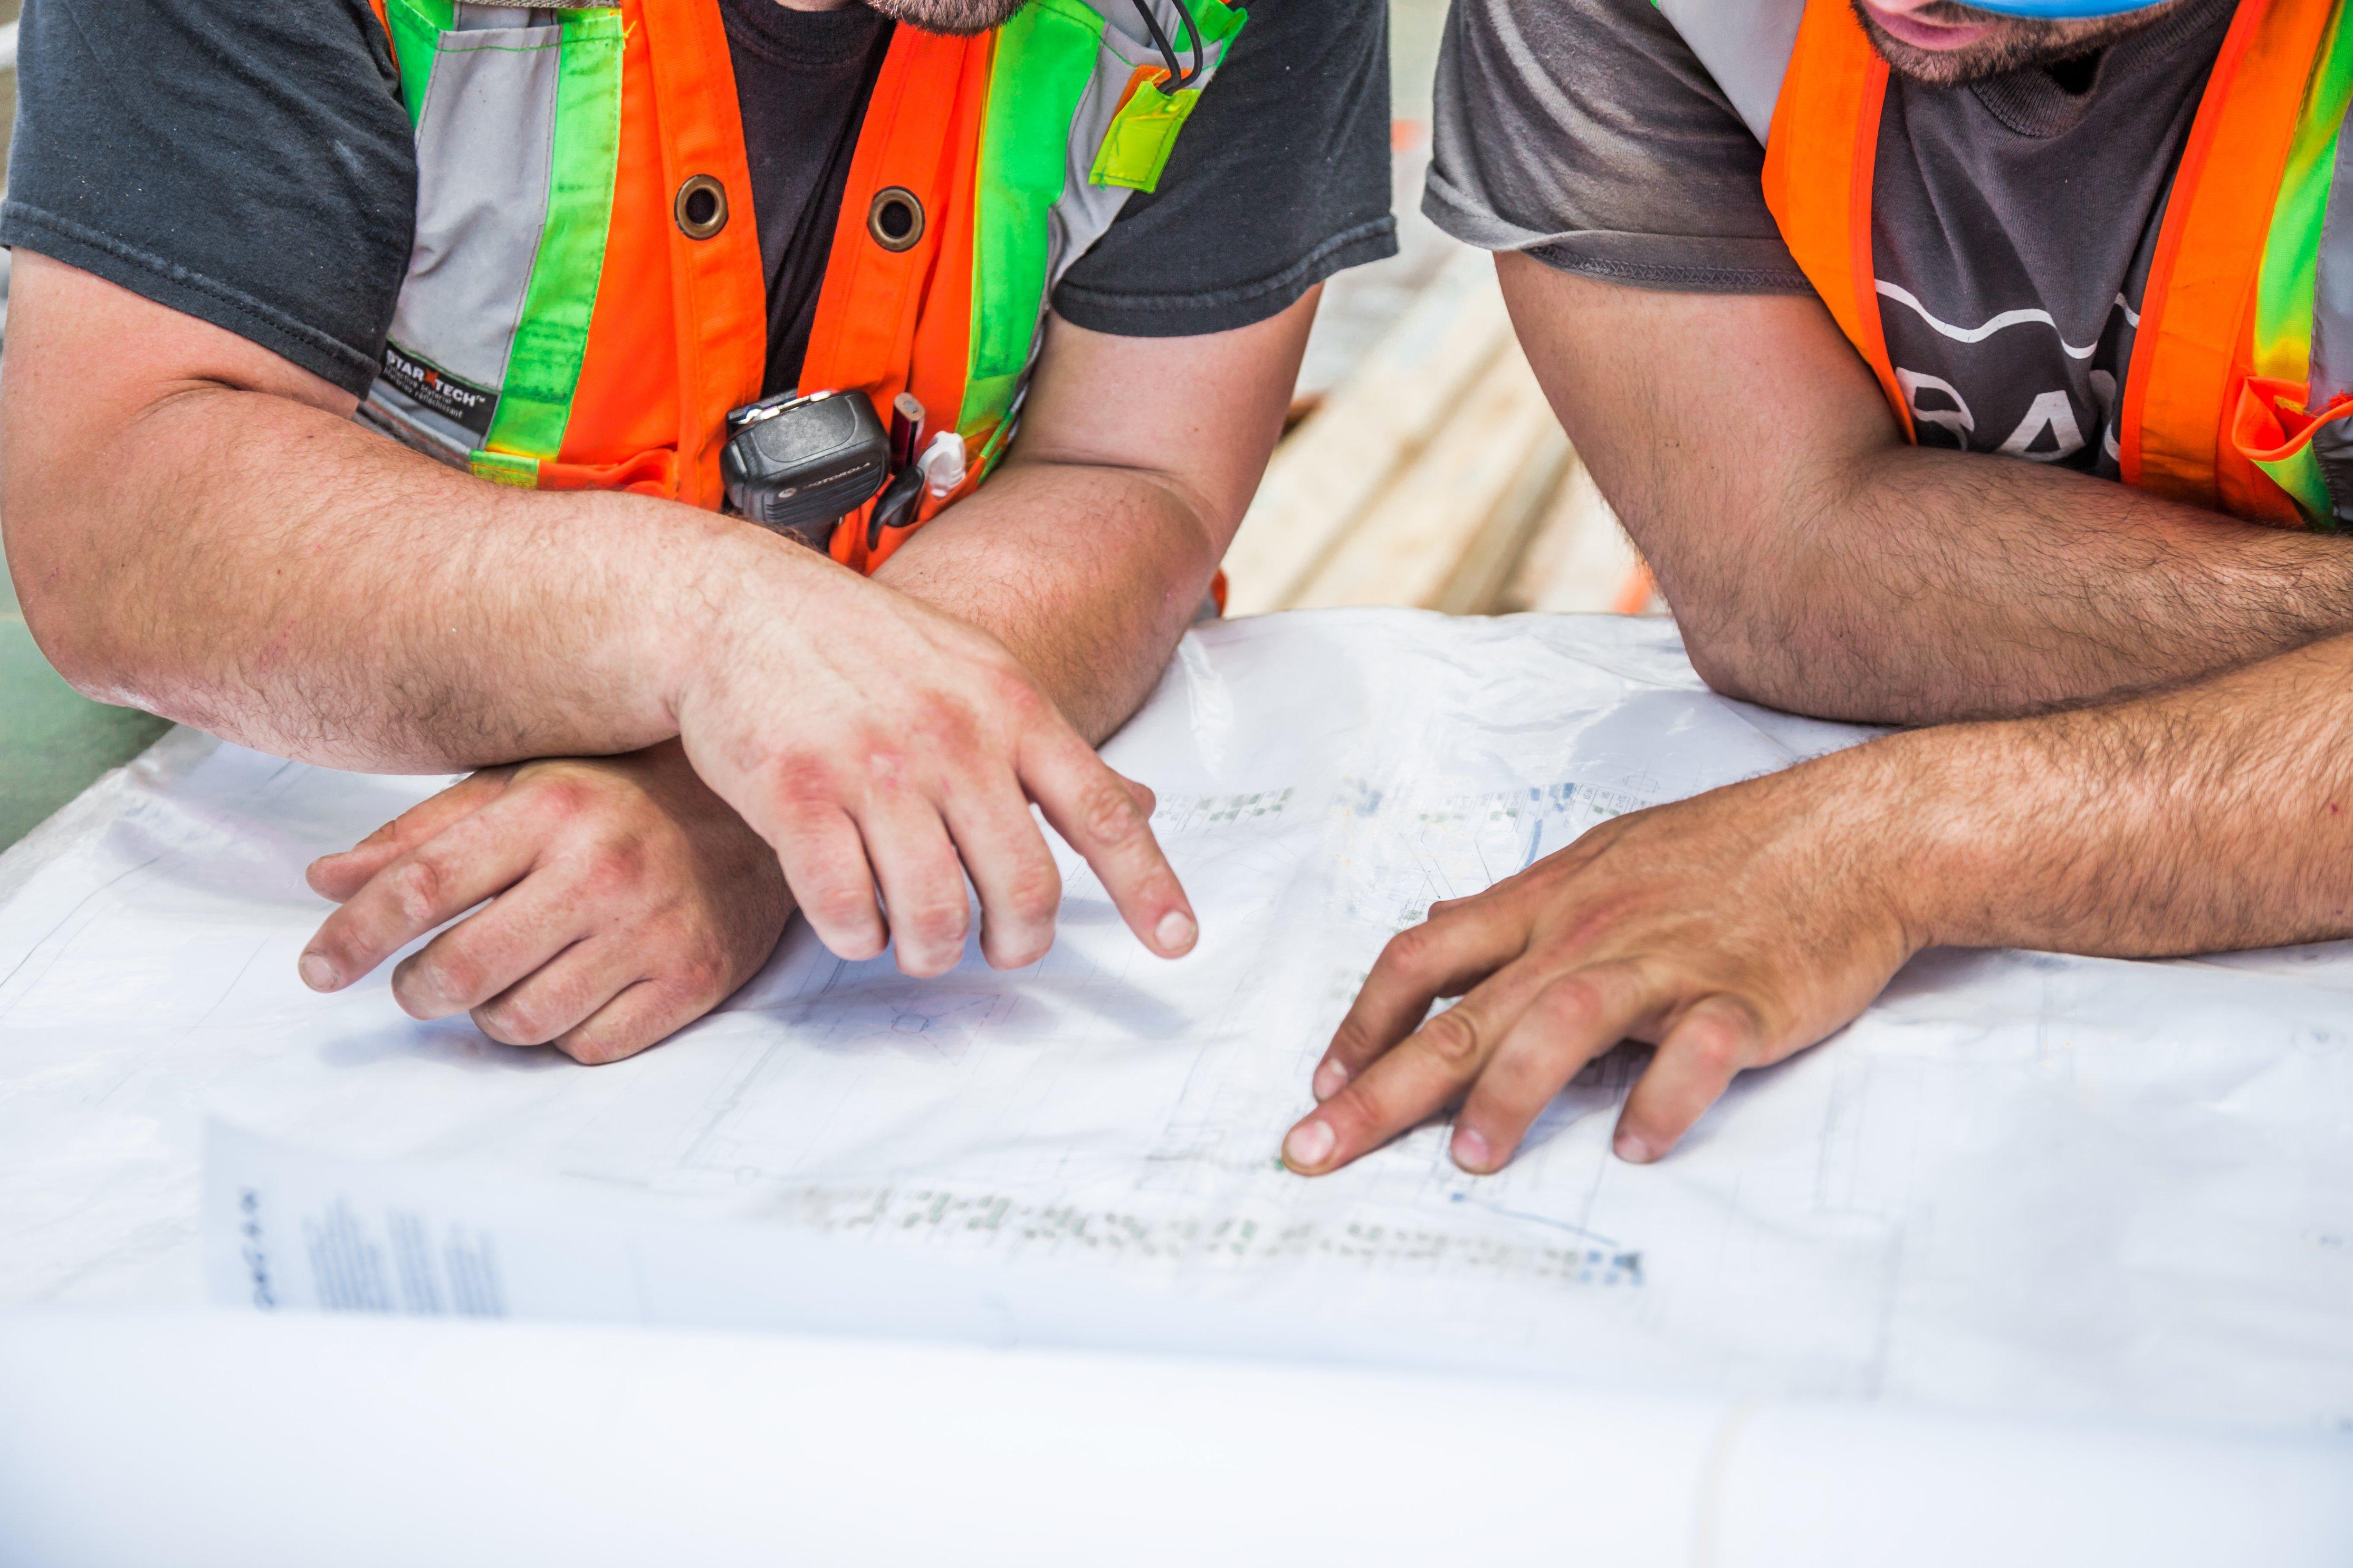 hands-on-blueprints_4460x4460.jpg